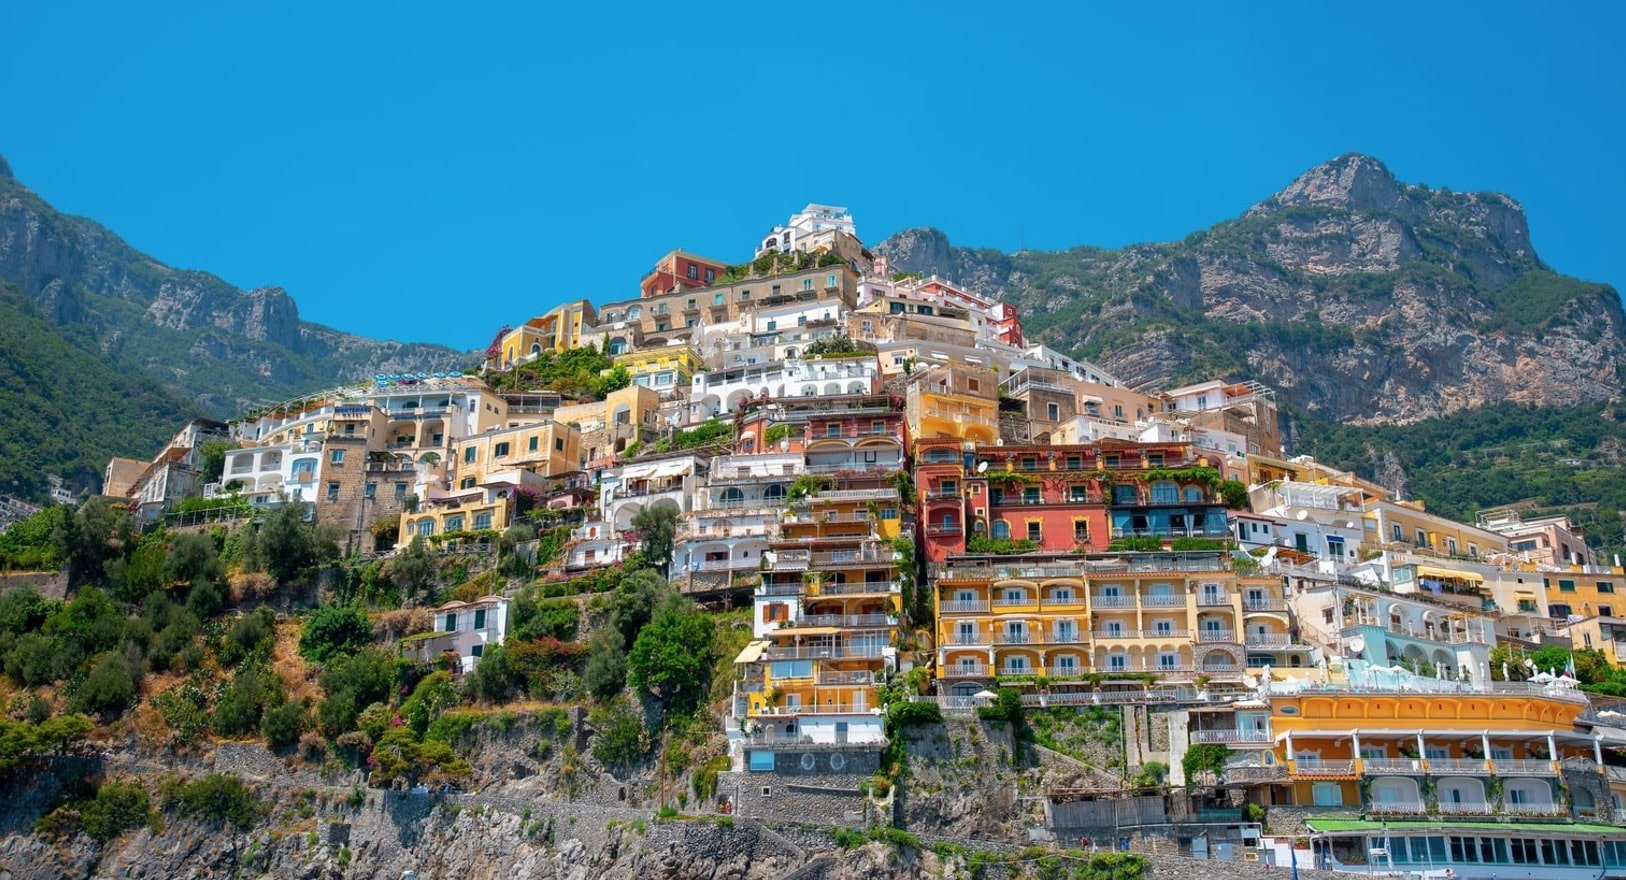 Amalfi and surroundings itinerary by car